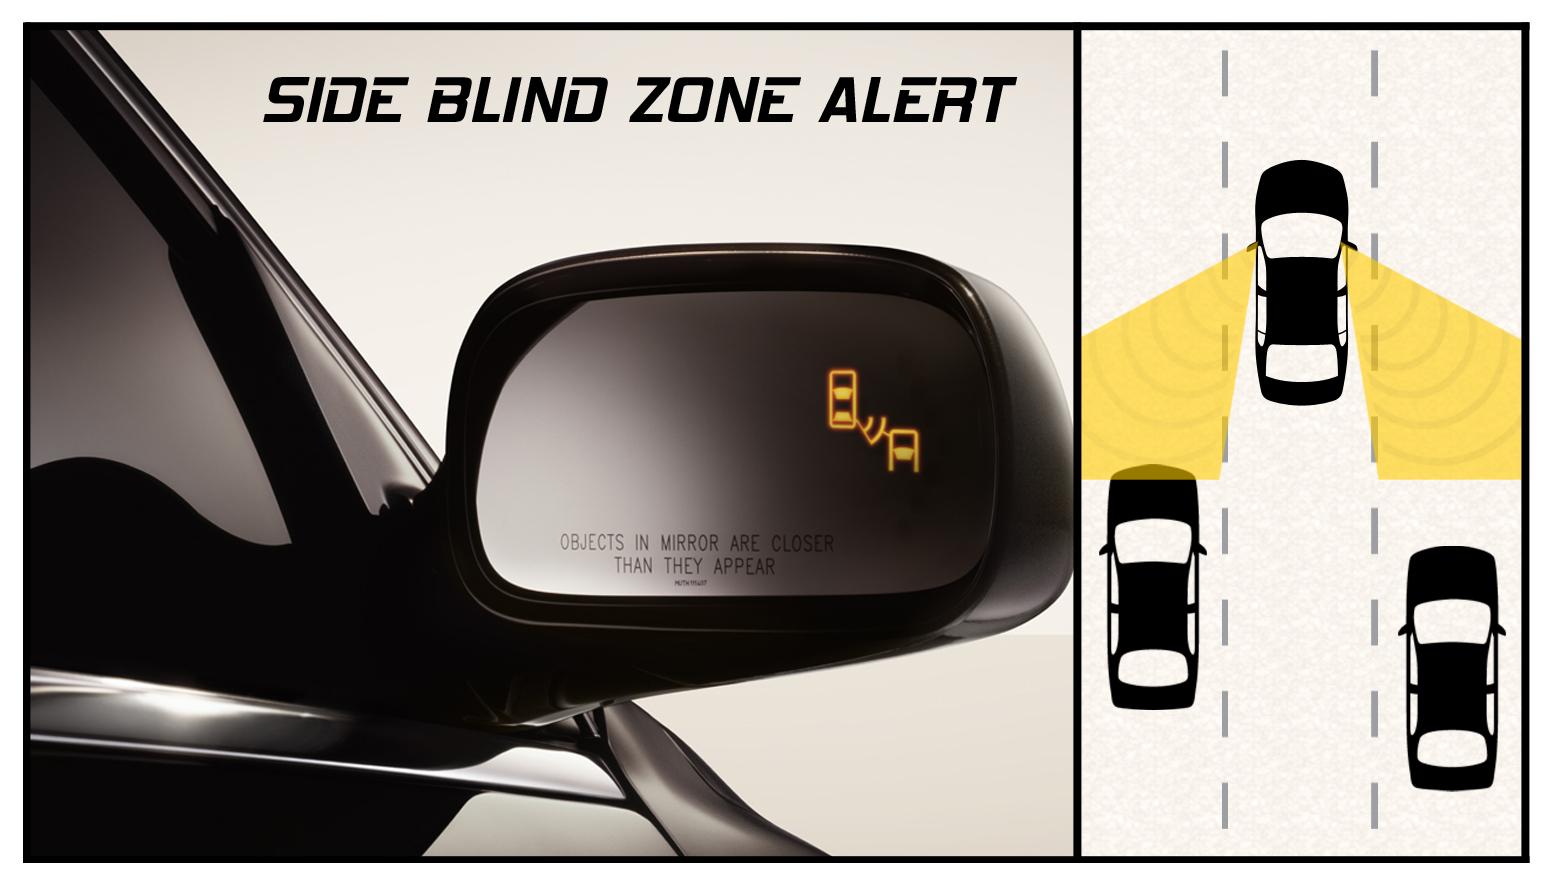 Buick LaCrosse: Side Blind Zone Alert System